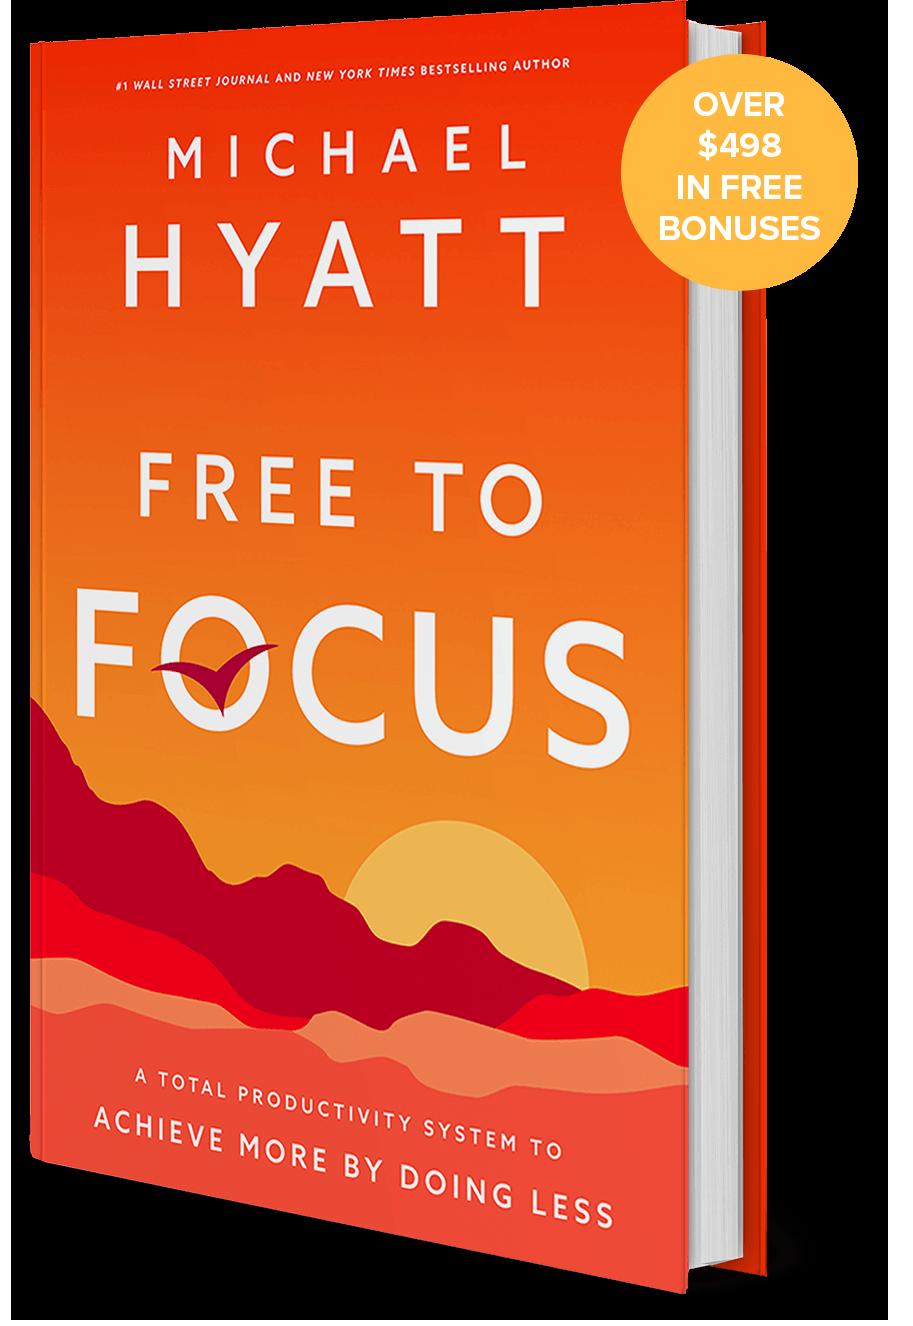 free-to-focus-book-michael-hyatt